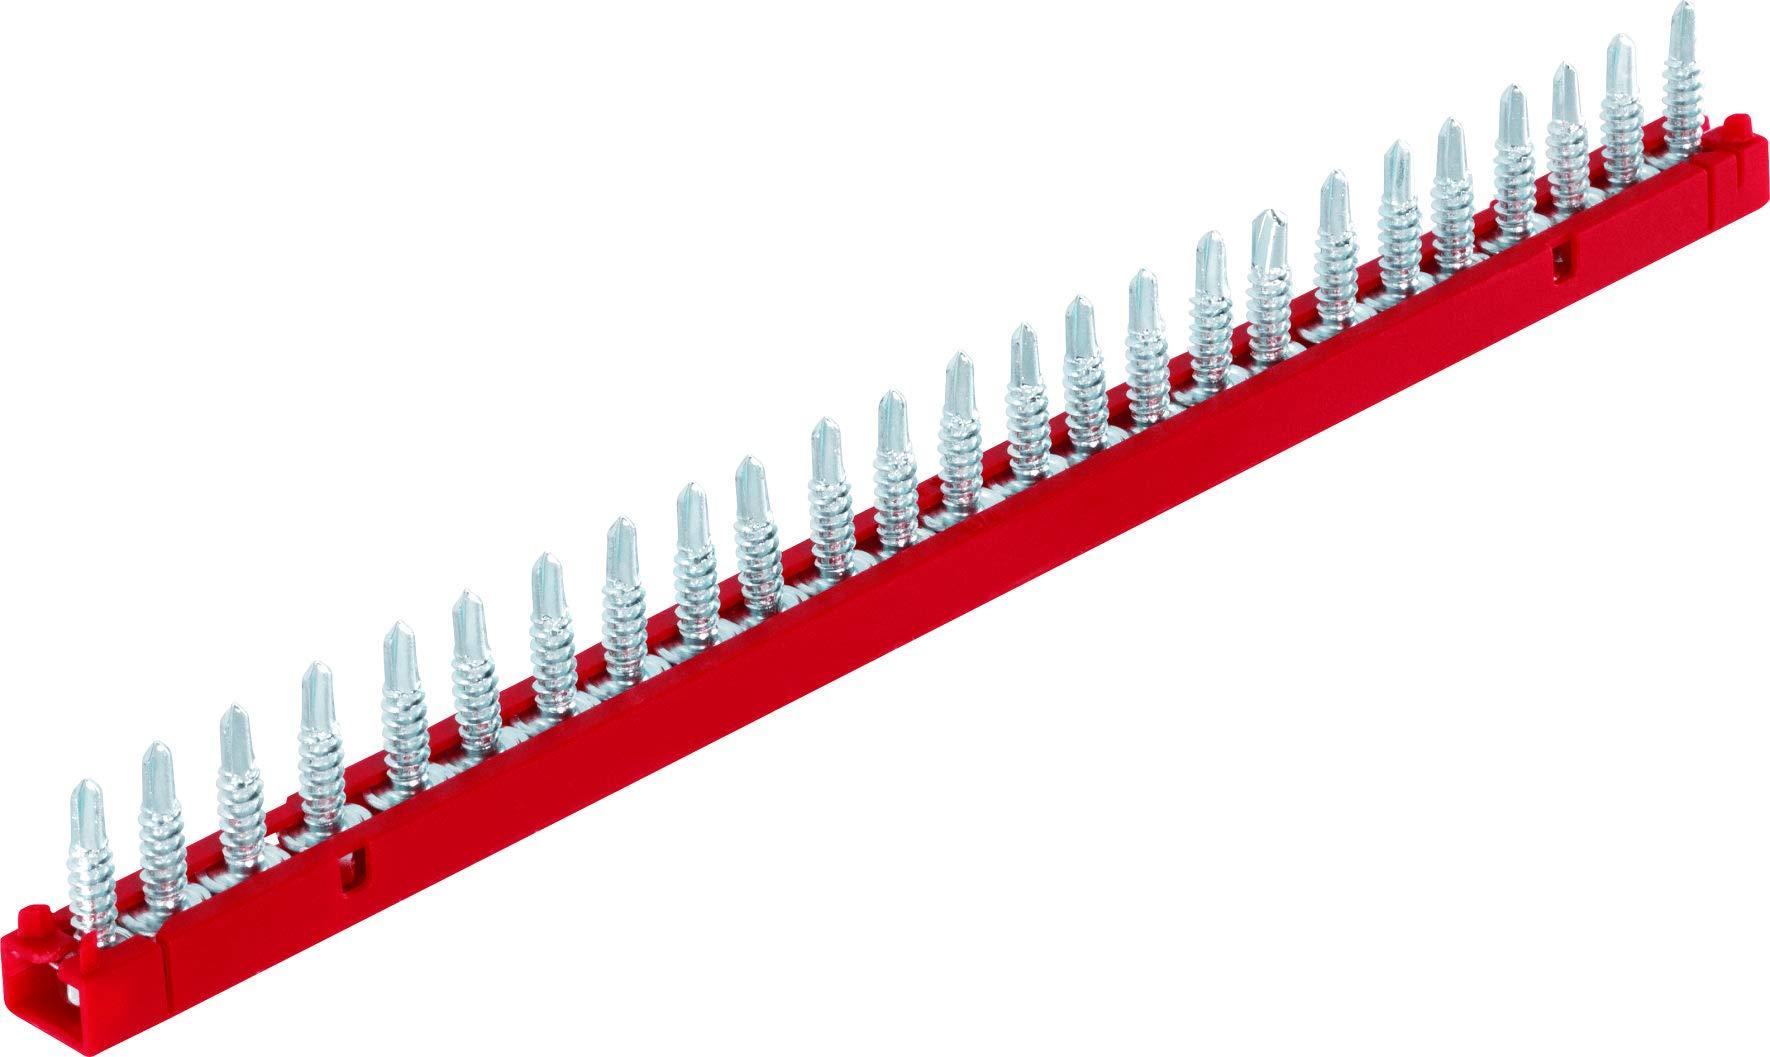 Hilti 378976Collated screw 10-16 x 3/4 SD M HWH3